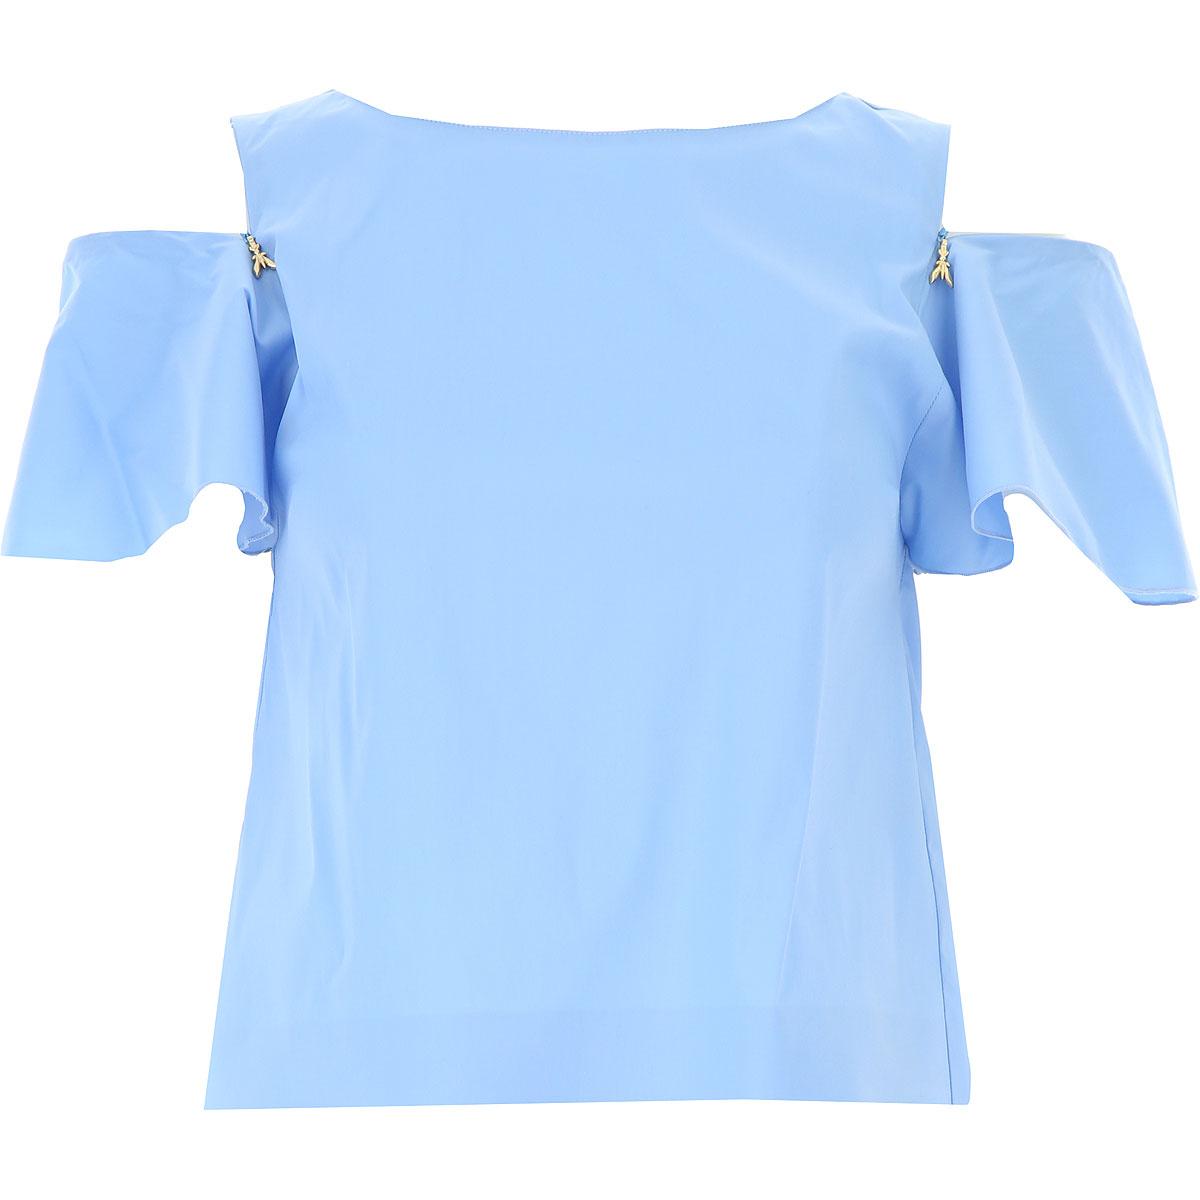 Patrizia Pepe Top for Women, Cosmic Blue, Cotton, 2017, 4 6 8